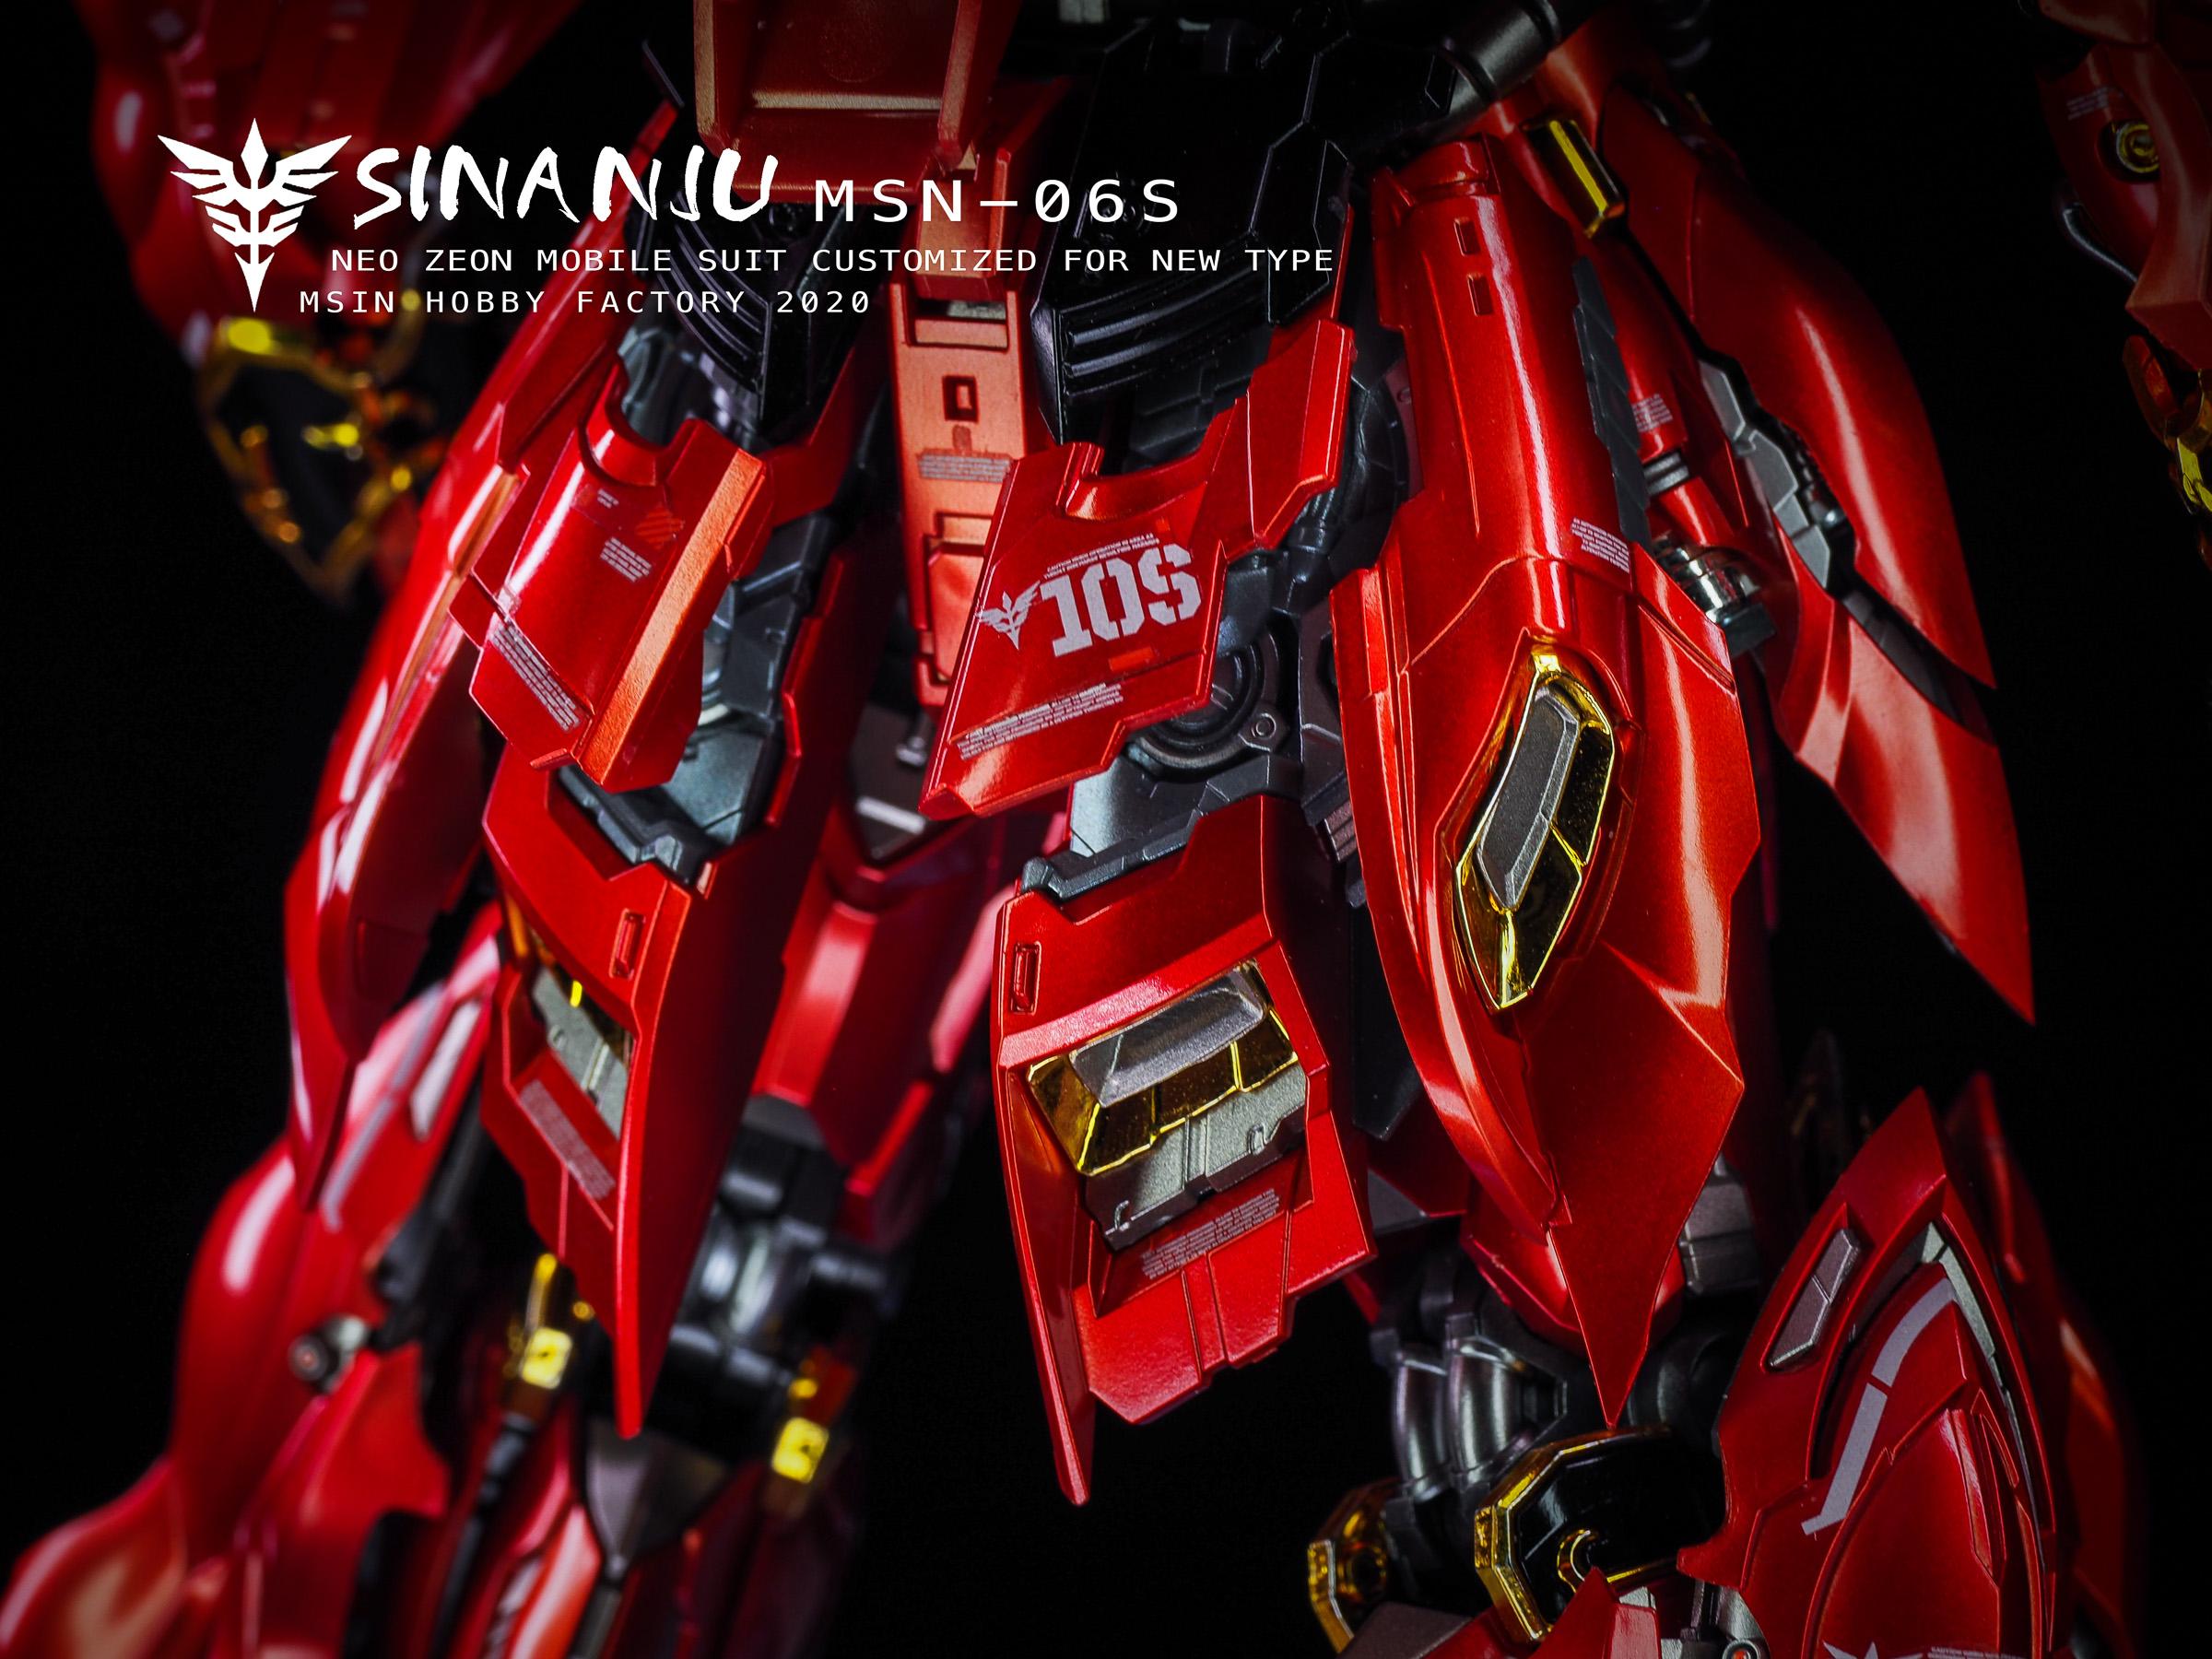 S437_6_takumi_sinanju_red_009.jpg